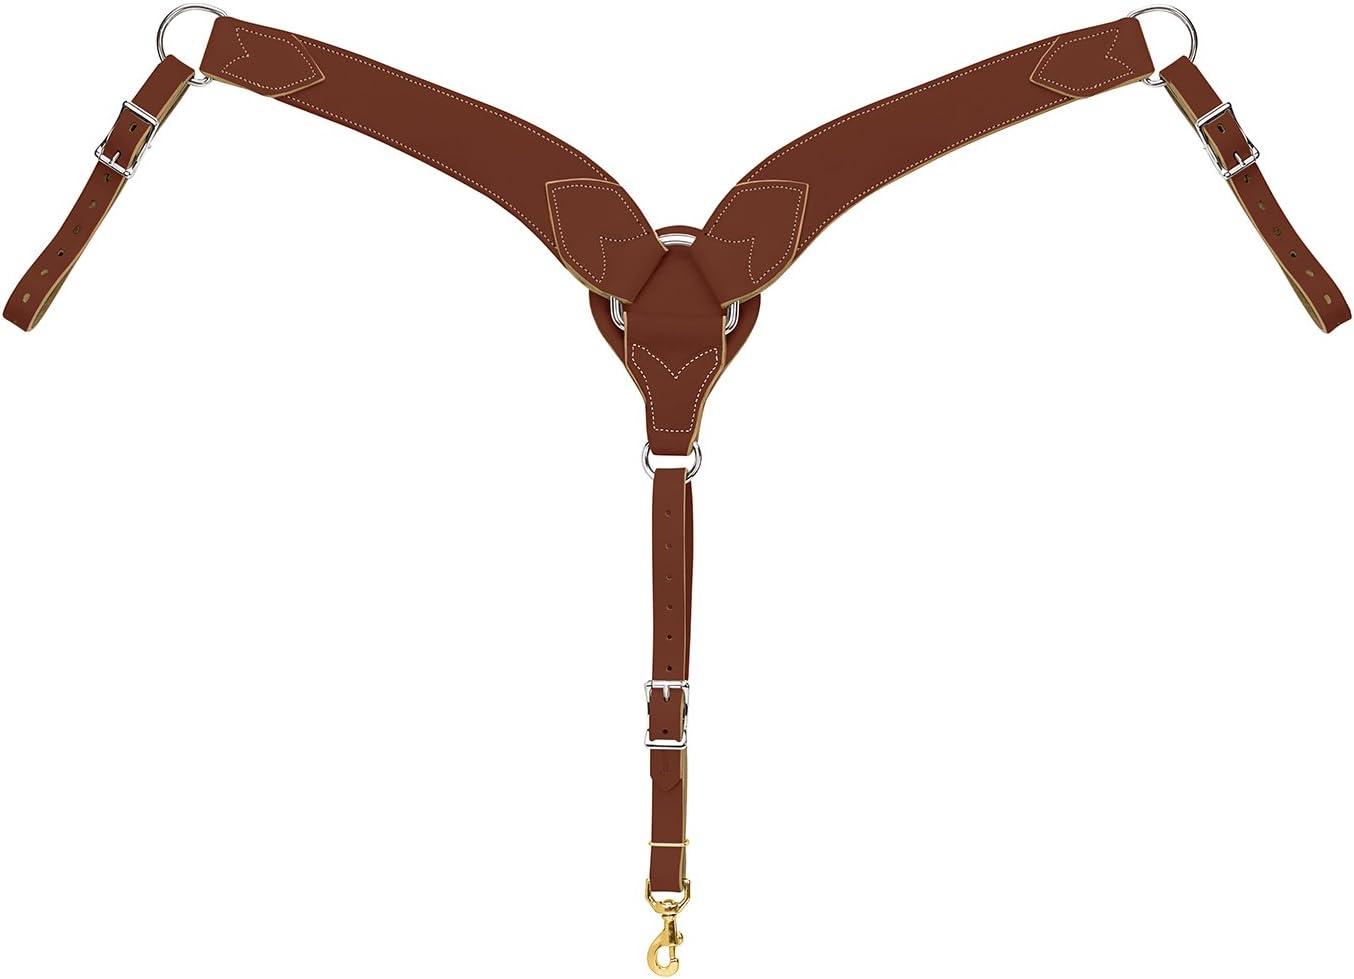 WEAVER Leather Ranking TOP1 Horizon Bombing free shipping Breast Collar Roper